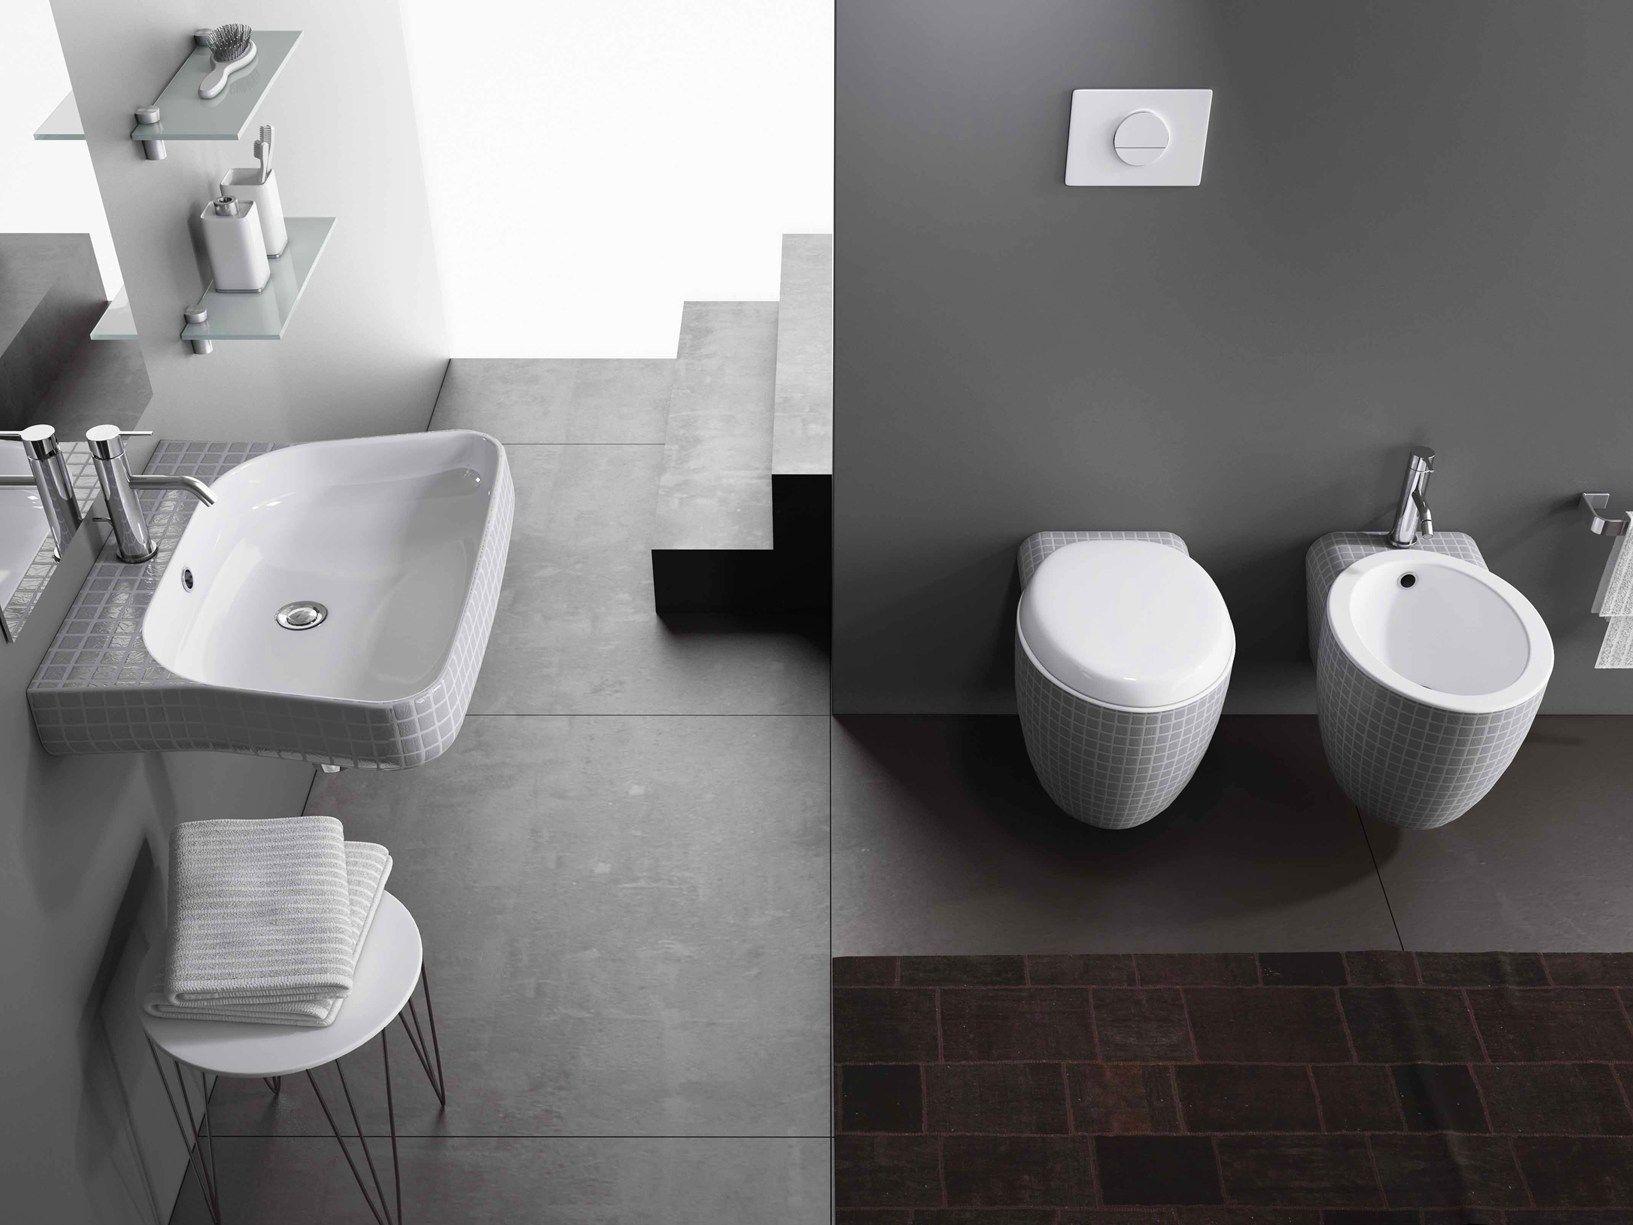 stile interpreta lambiente bagno con mosaiko